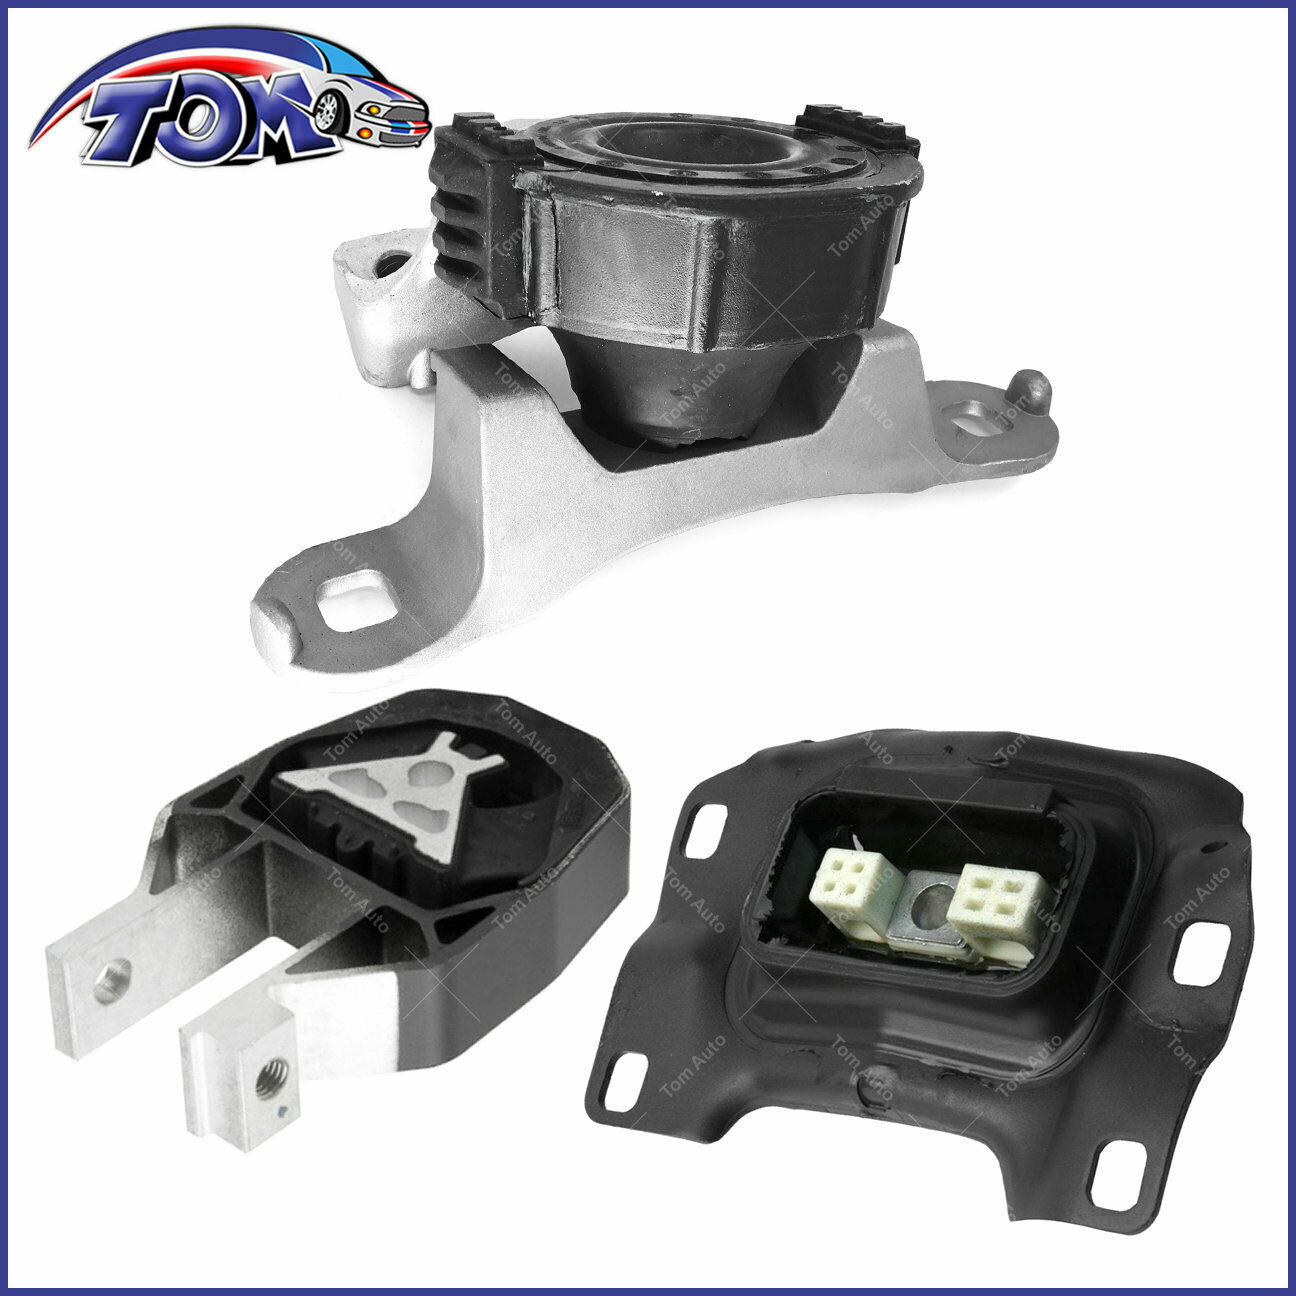 Pro Braking PBR0058-CAR-SIL Rear Braided Brake Line Carbolook Hose /& Stainless Banjos